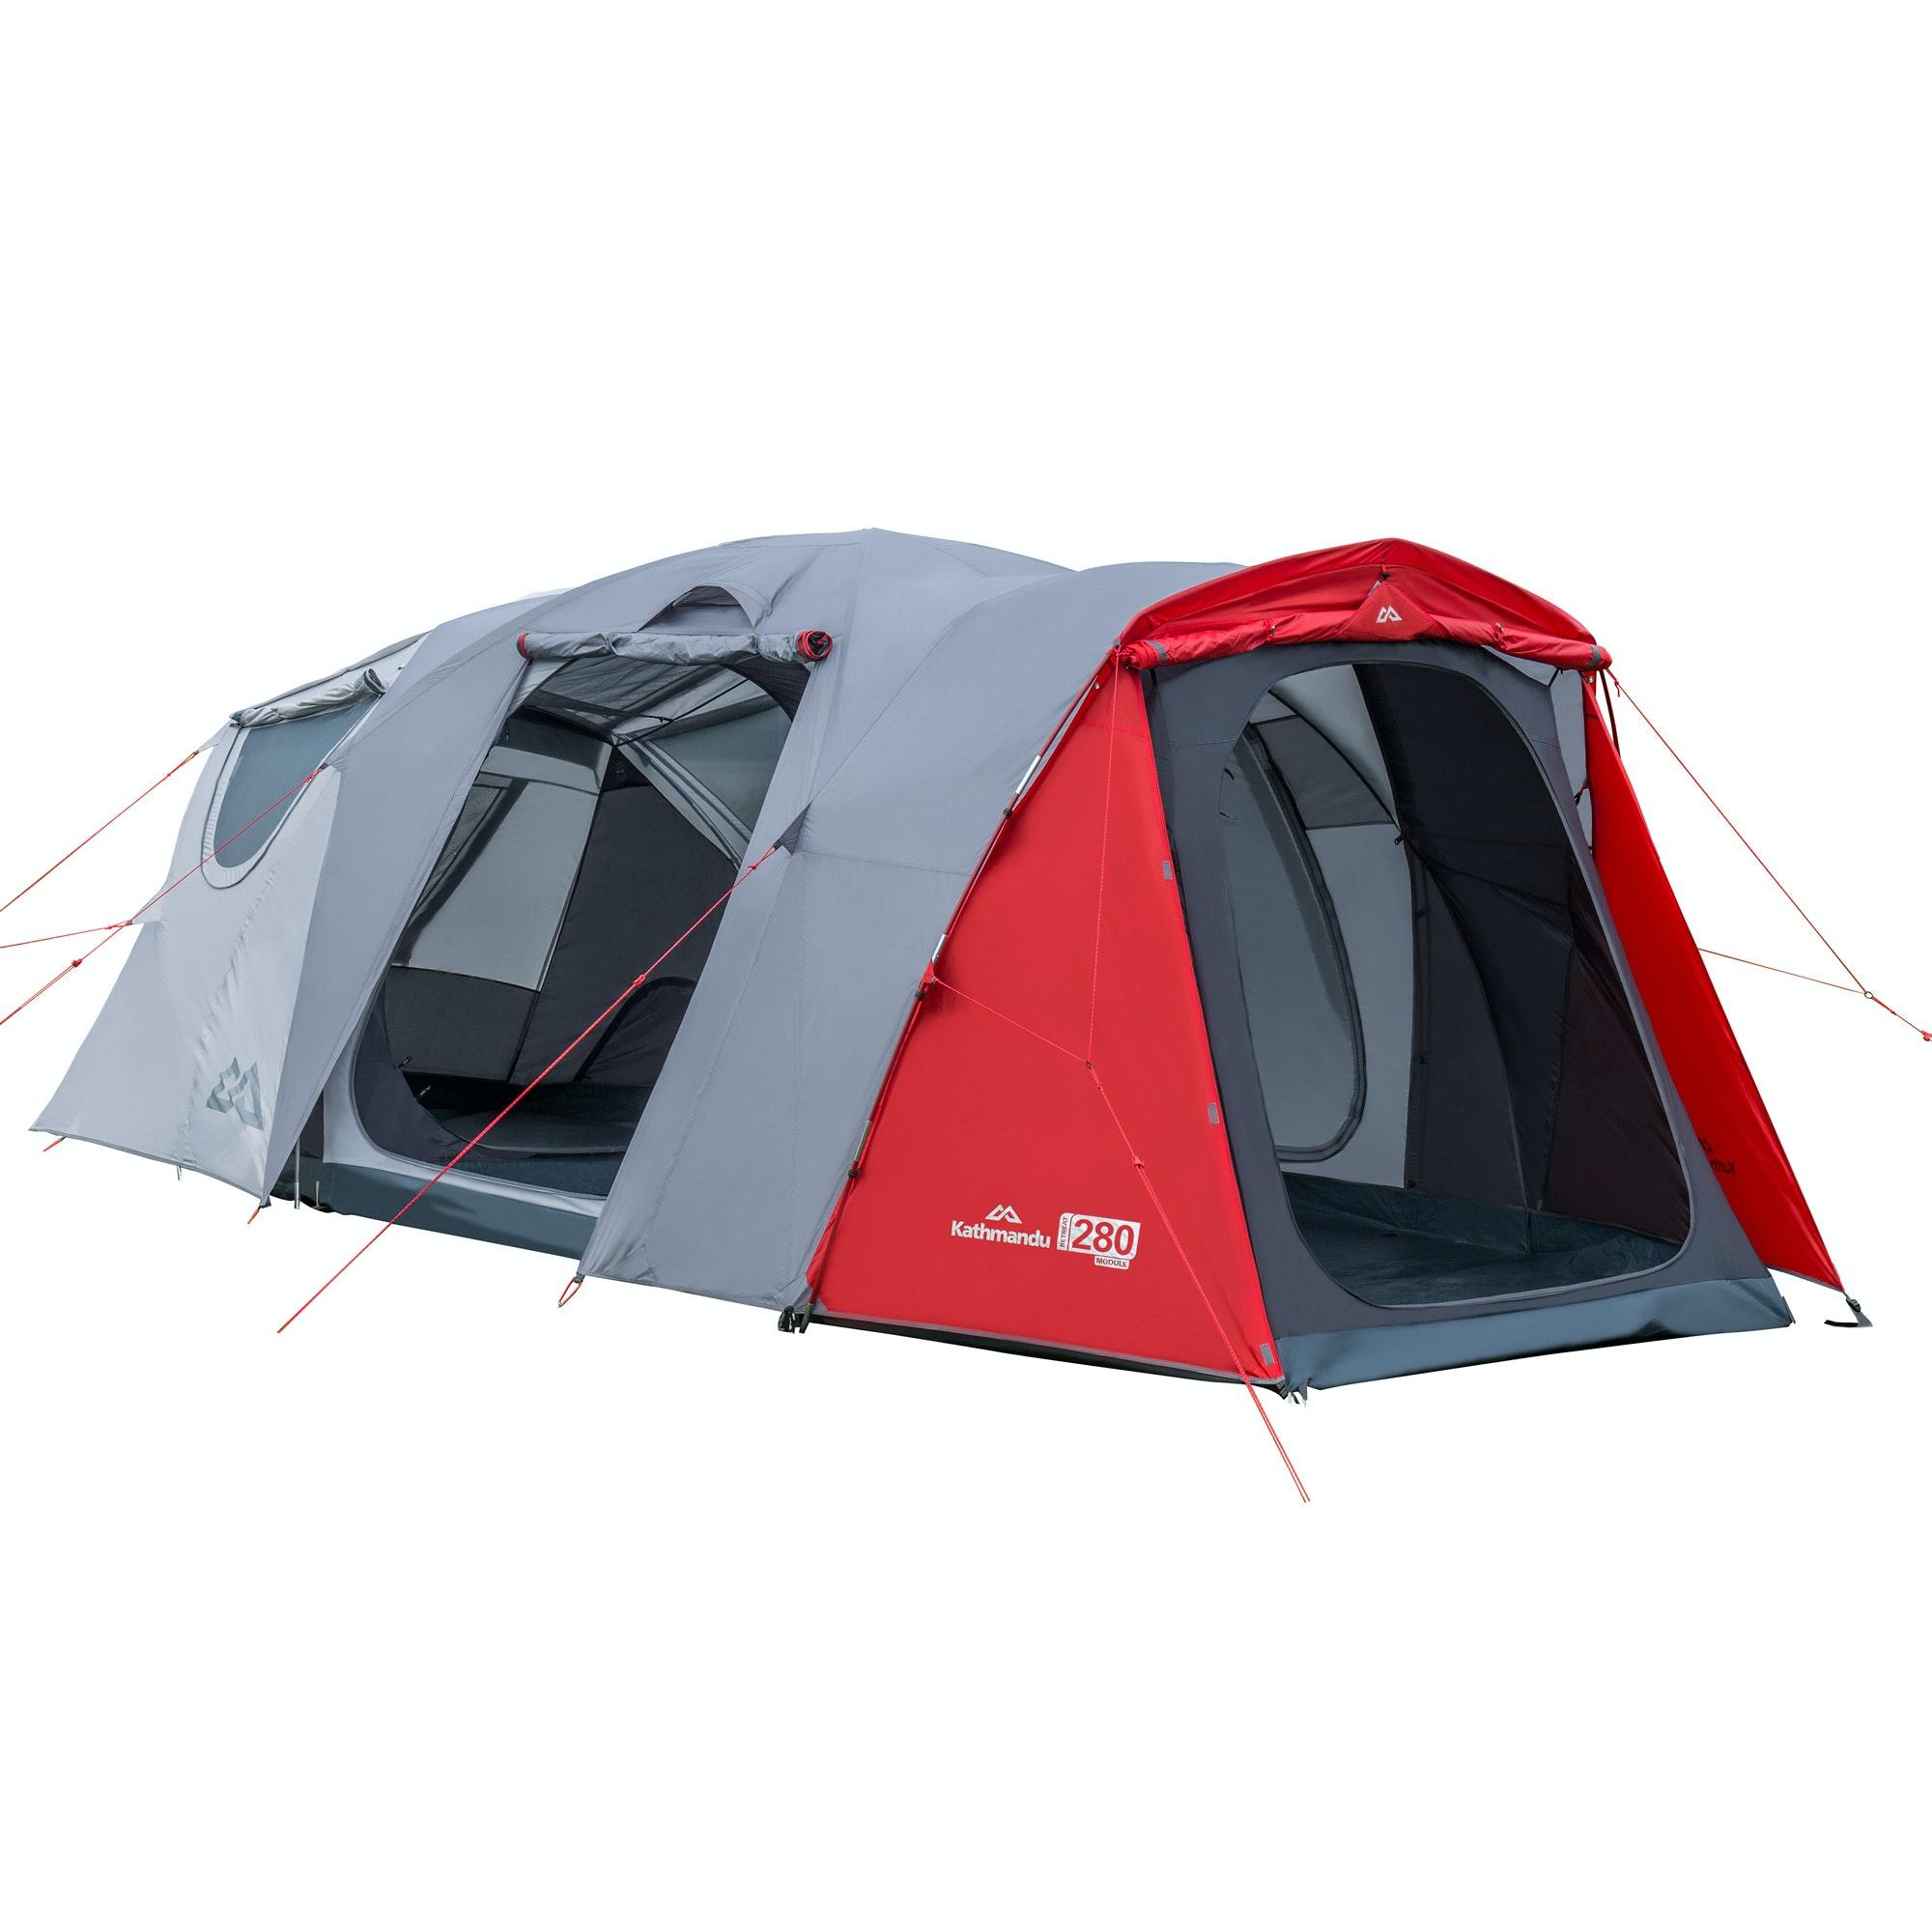 Retreat 280 5 Person Module Tent  sc 1 st  Kathmandu & Tents for Sale | 23456 u0026 7 Person Tent | Kathmandu NZ